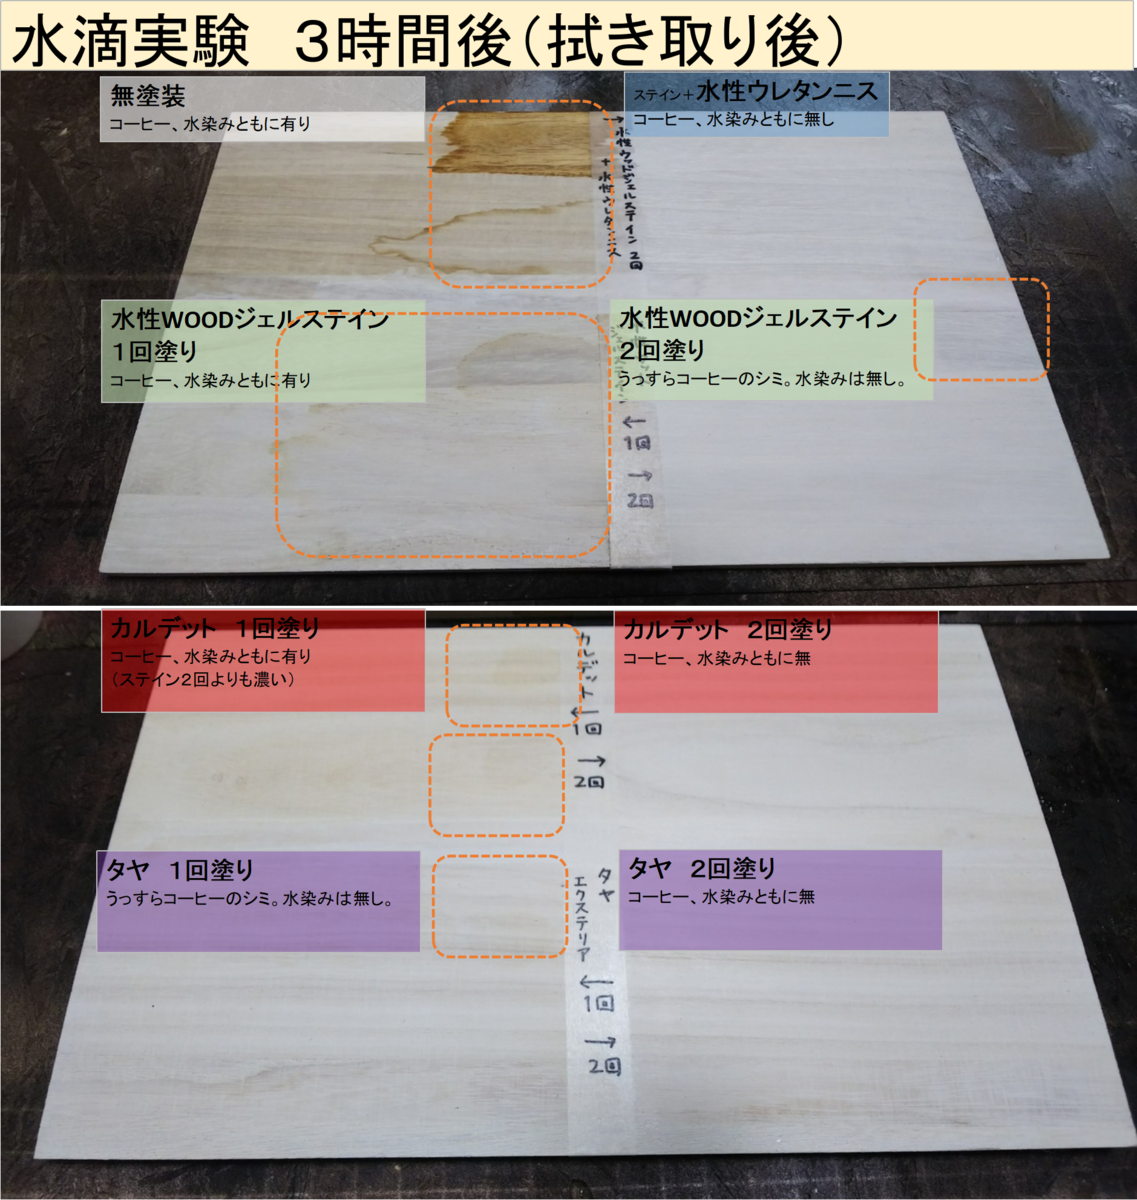 f:id:natsumikandiy:20210523012632p:plain